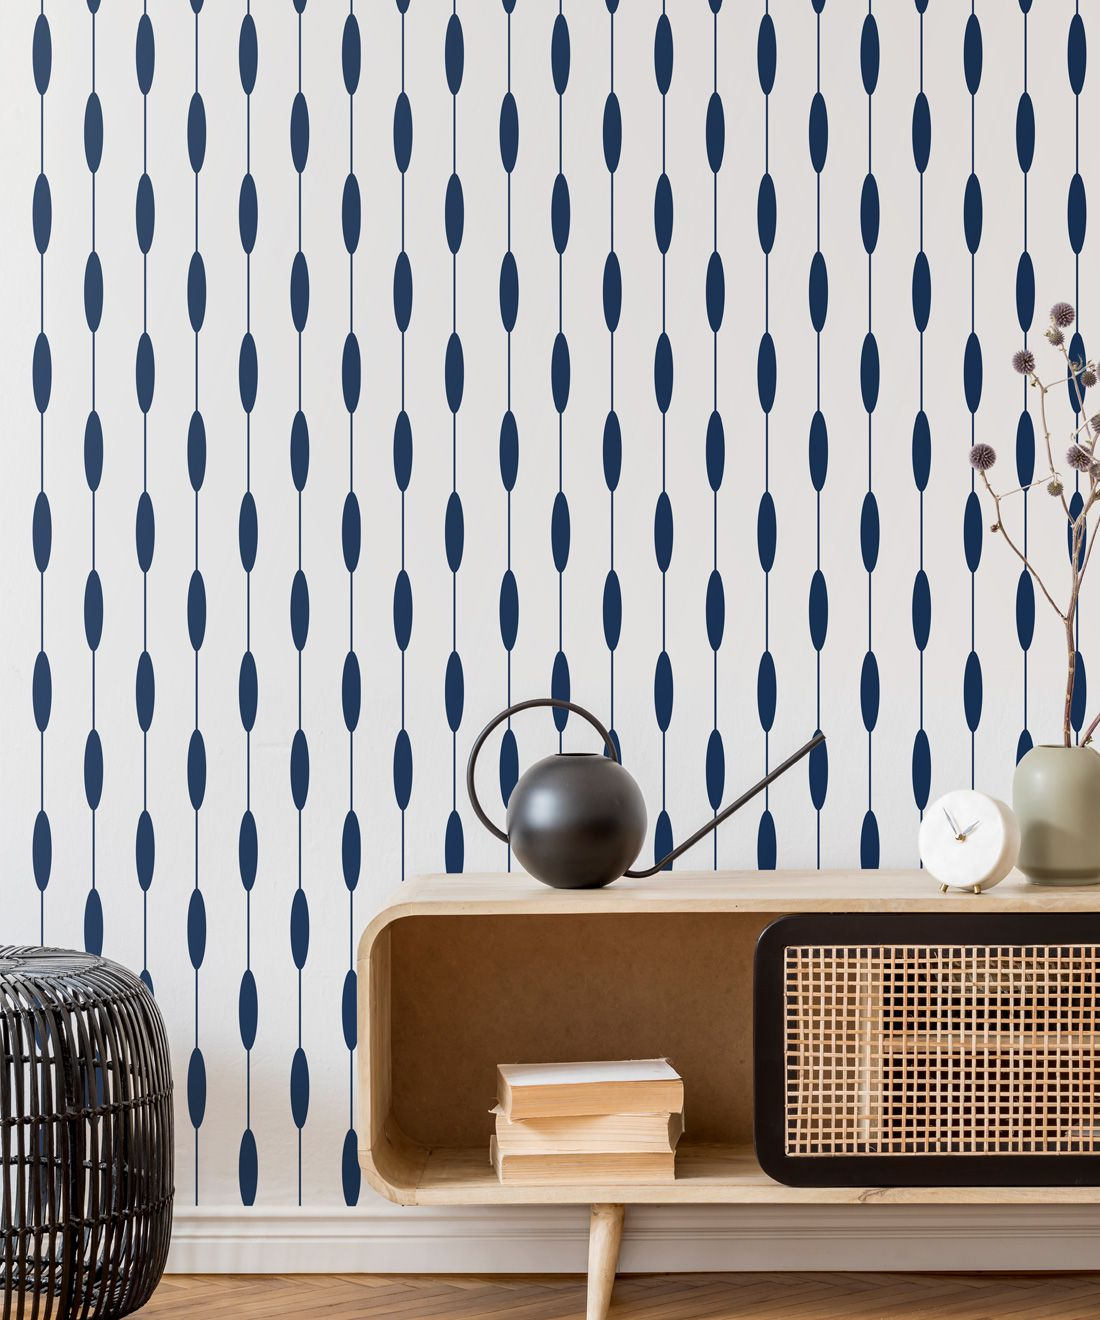 Bowline Wallpaper • Geometric Wallpaper • Striped Wallpaper • Navy Wallpaper •Insitu